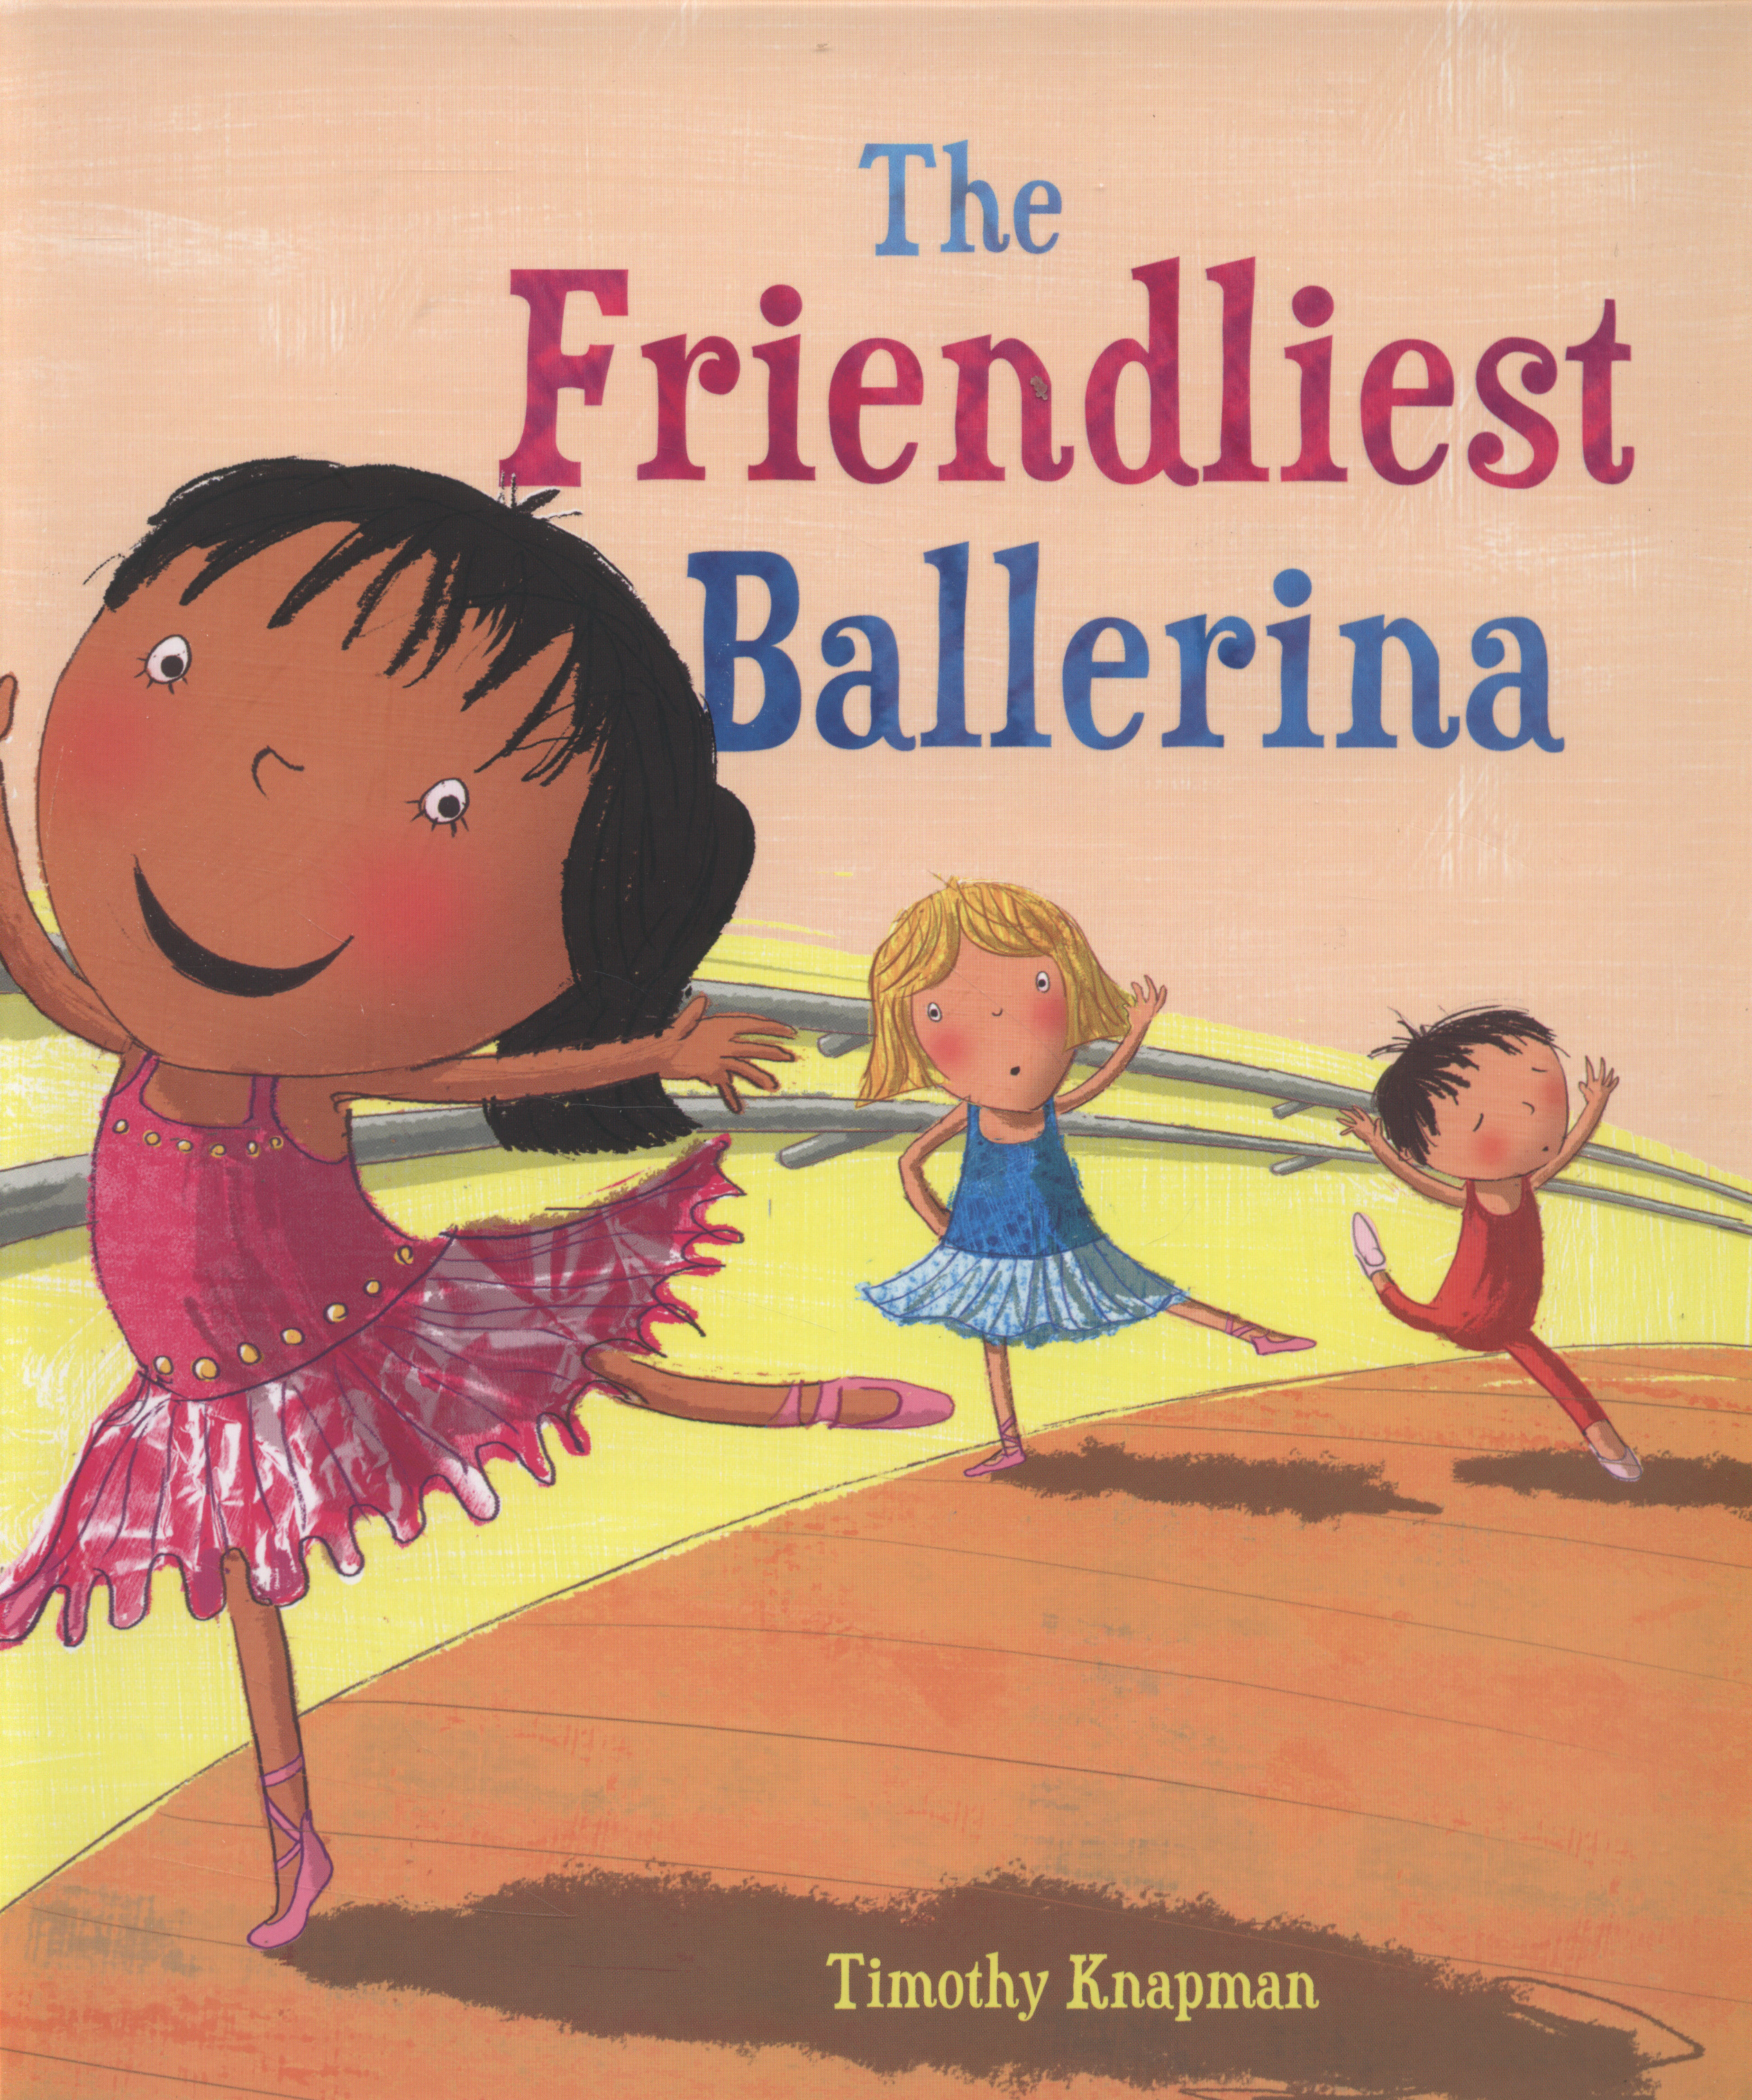 Image for The friendliest ballerina